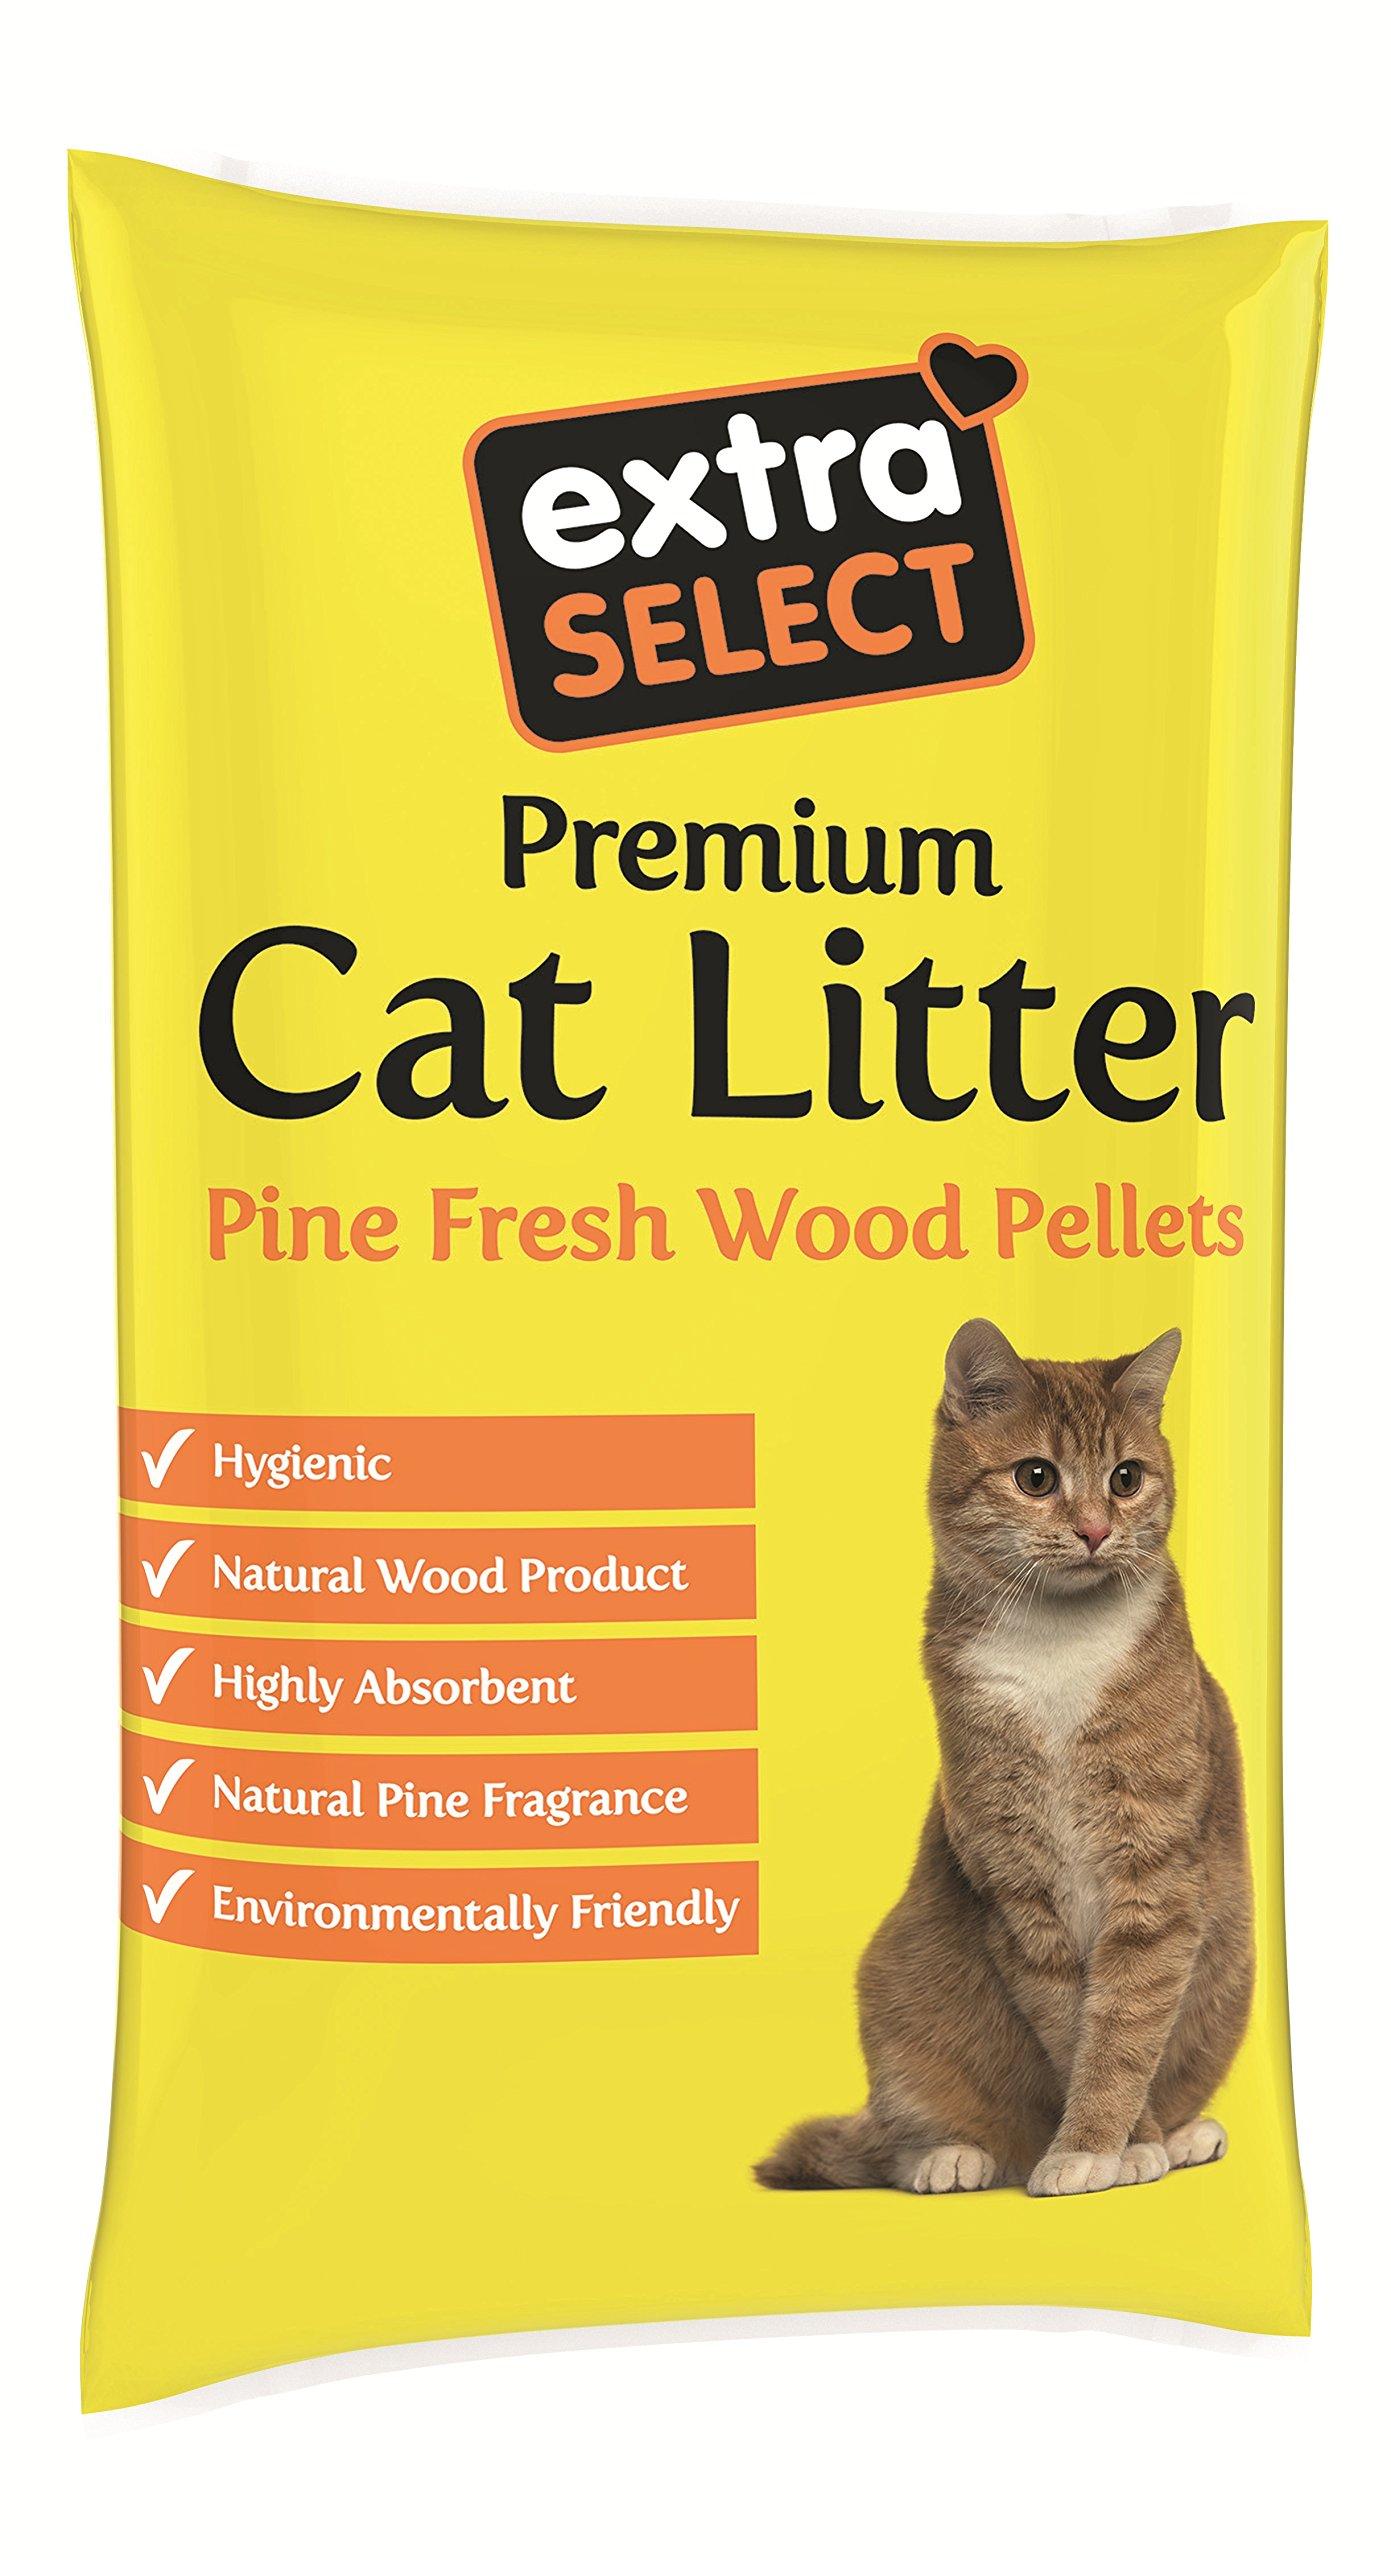 Extra Select Premium Wood Based Cat Litter 30 L Amazon Co Uk Pet Supplies